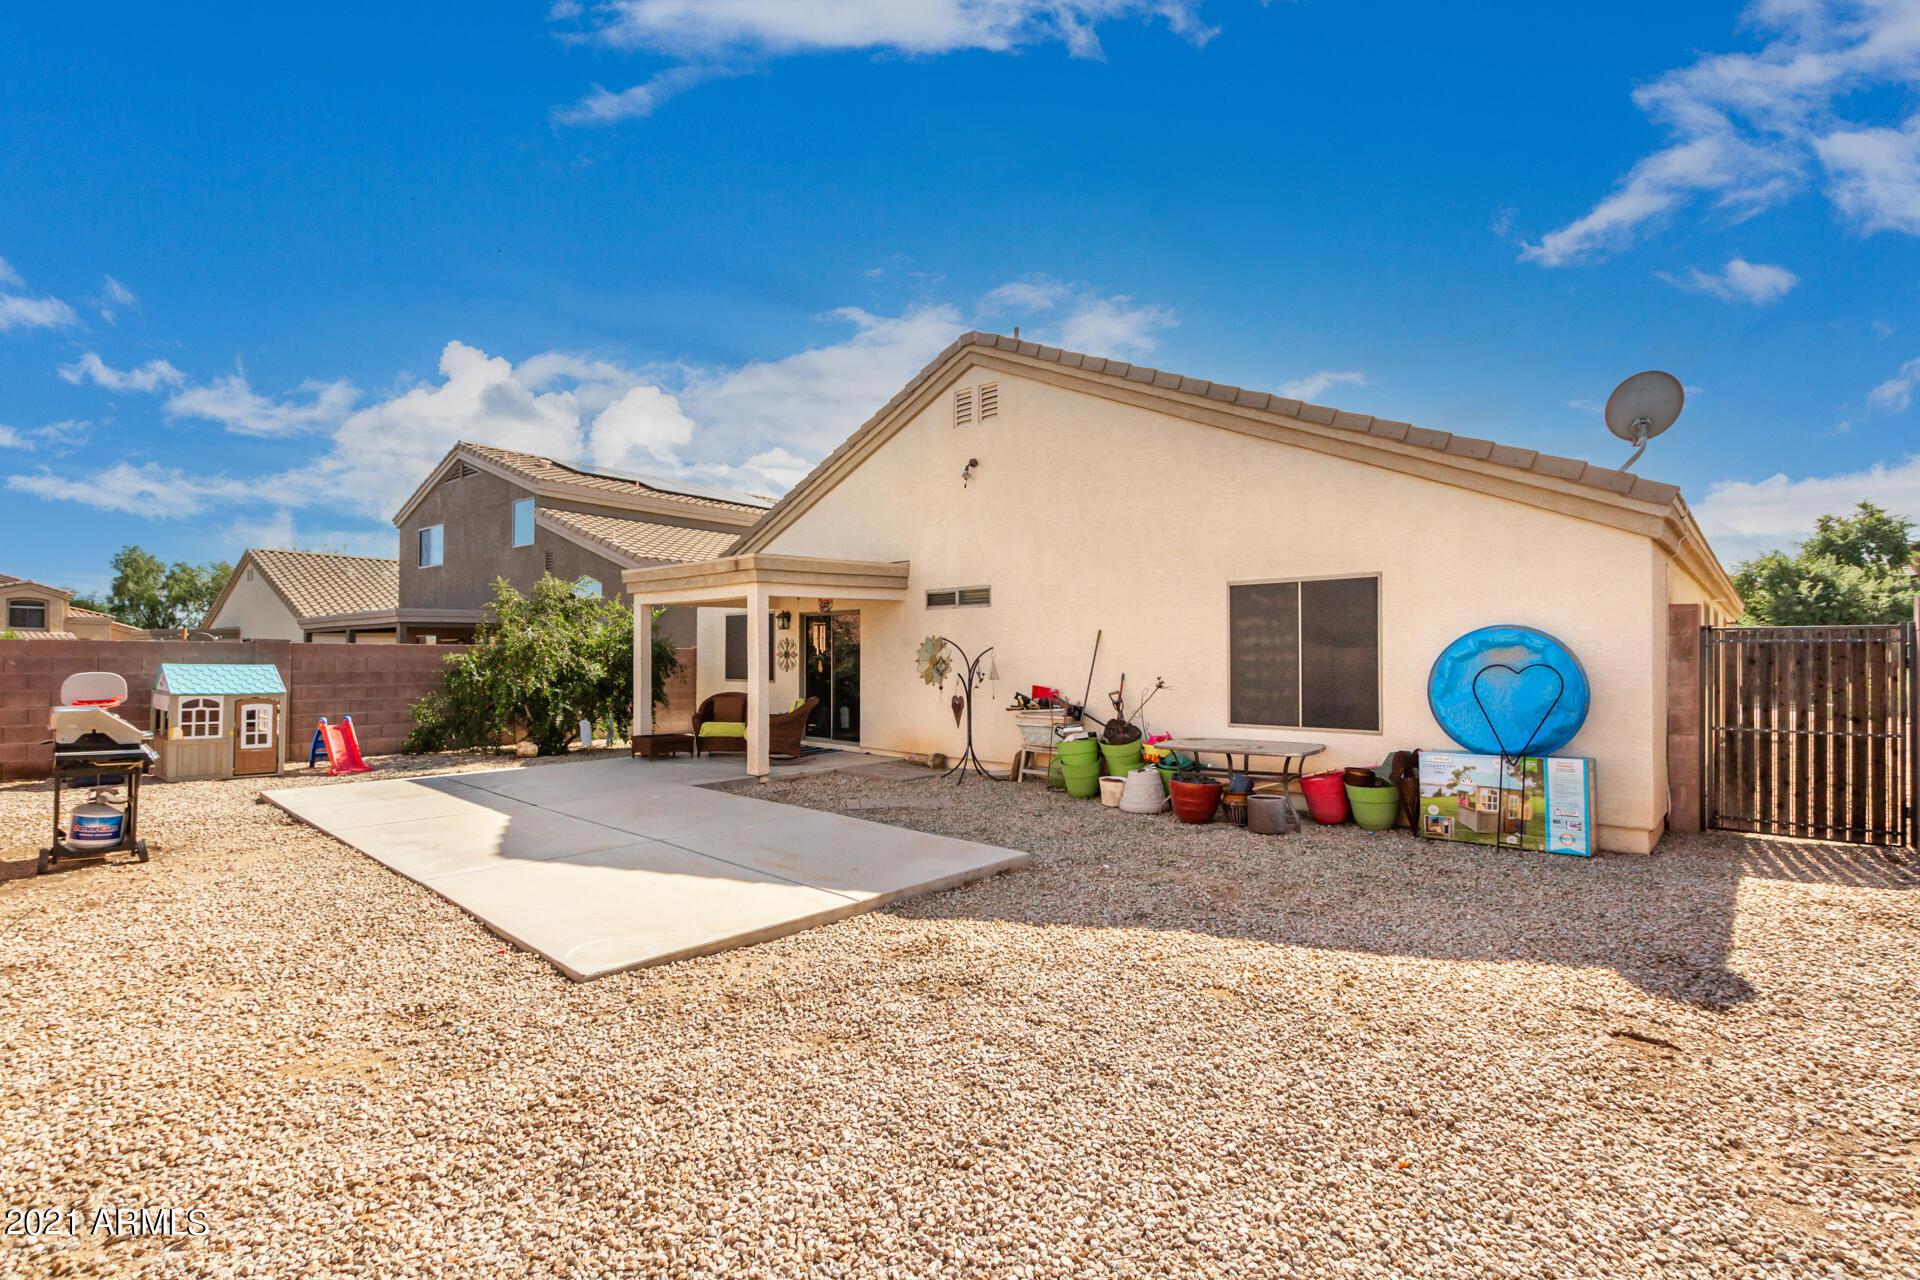 MLS 6311651 3476 W ALLENS PEAK Drive, Queen Creek, AZ 85142 Queen Creek AZ REO Bank Owned Foreclosure